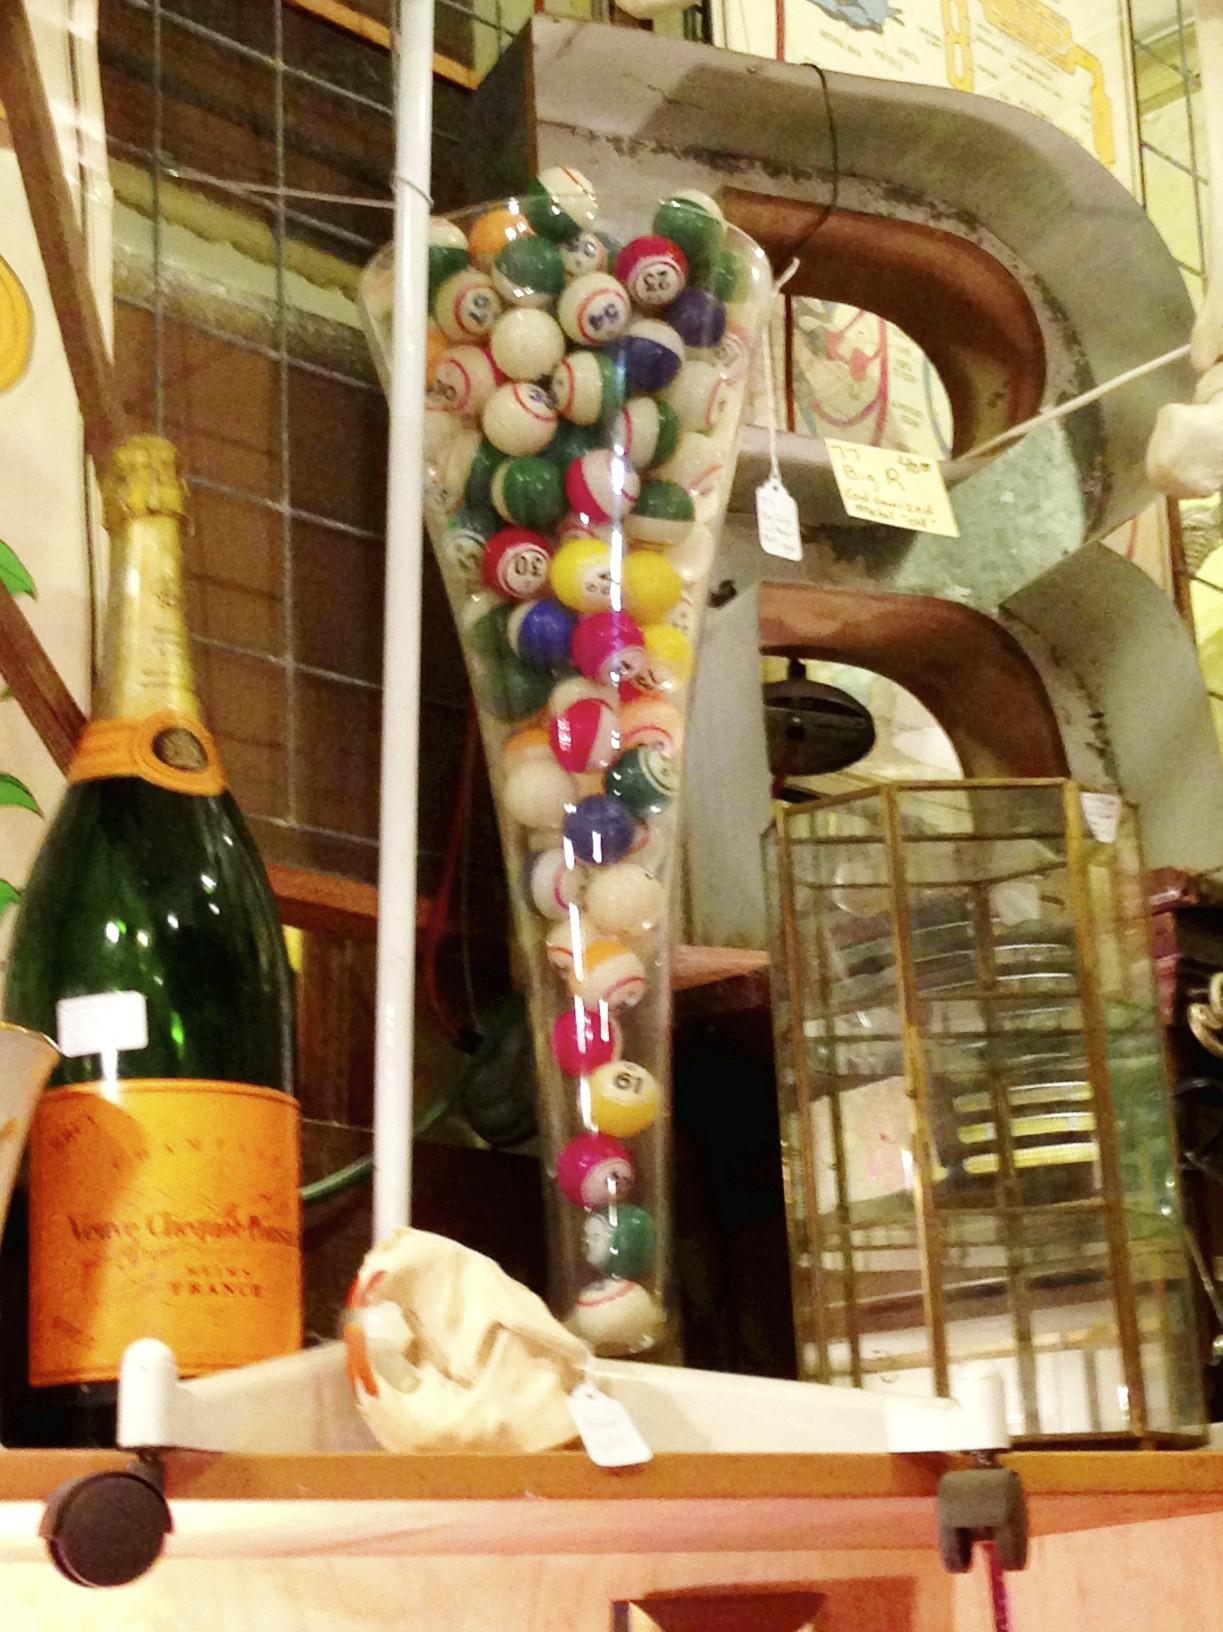 bingo balls, champagne bottle